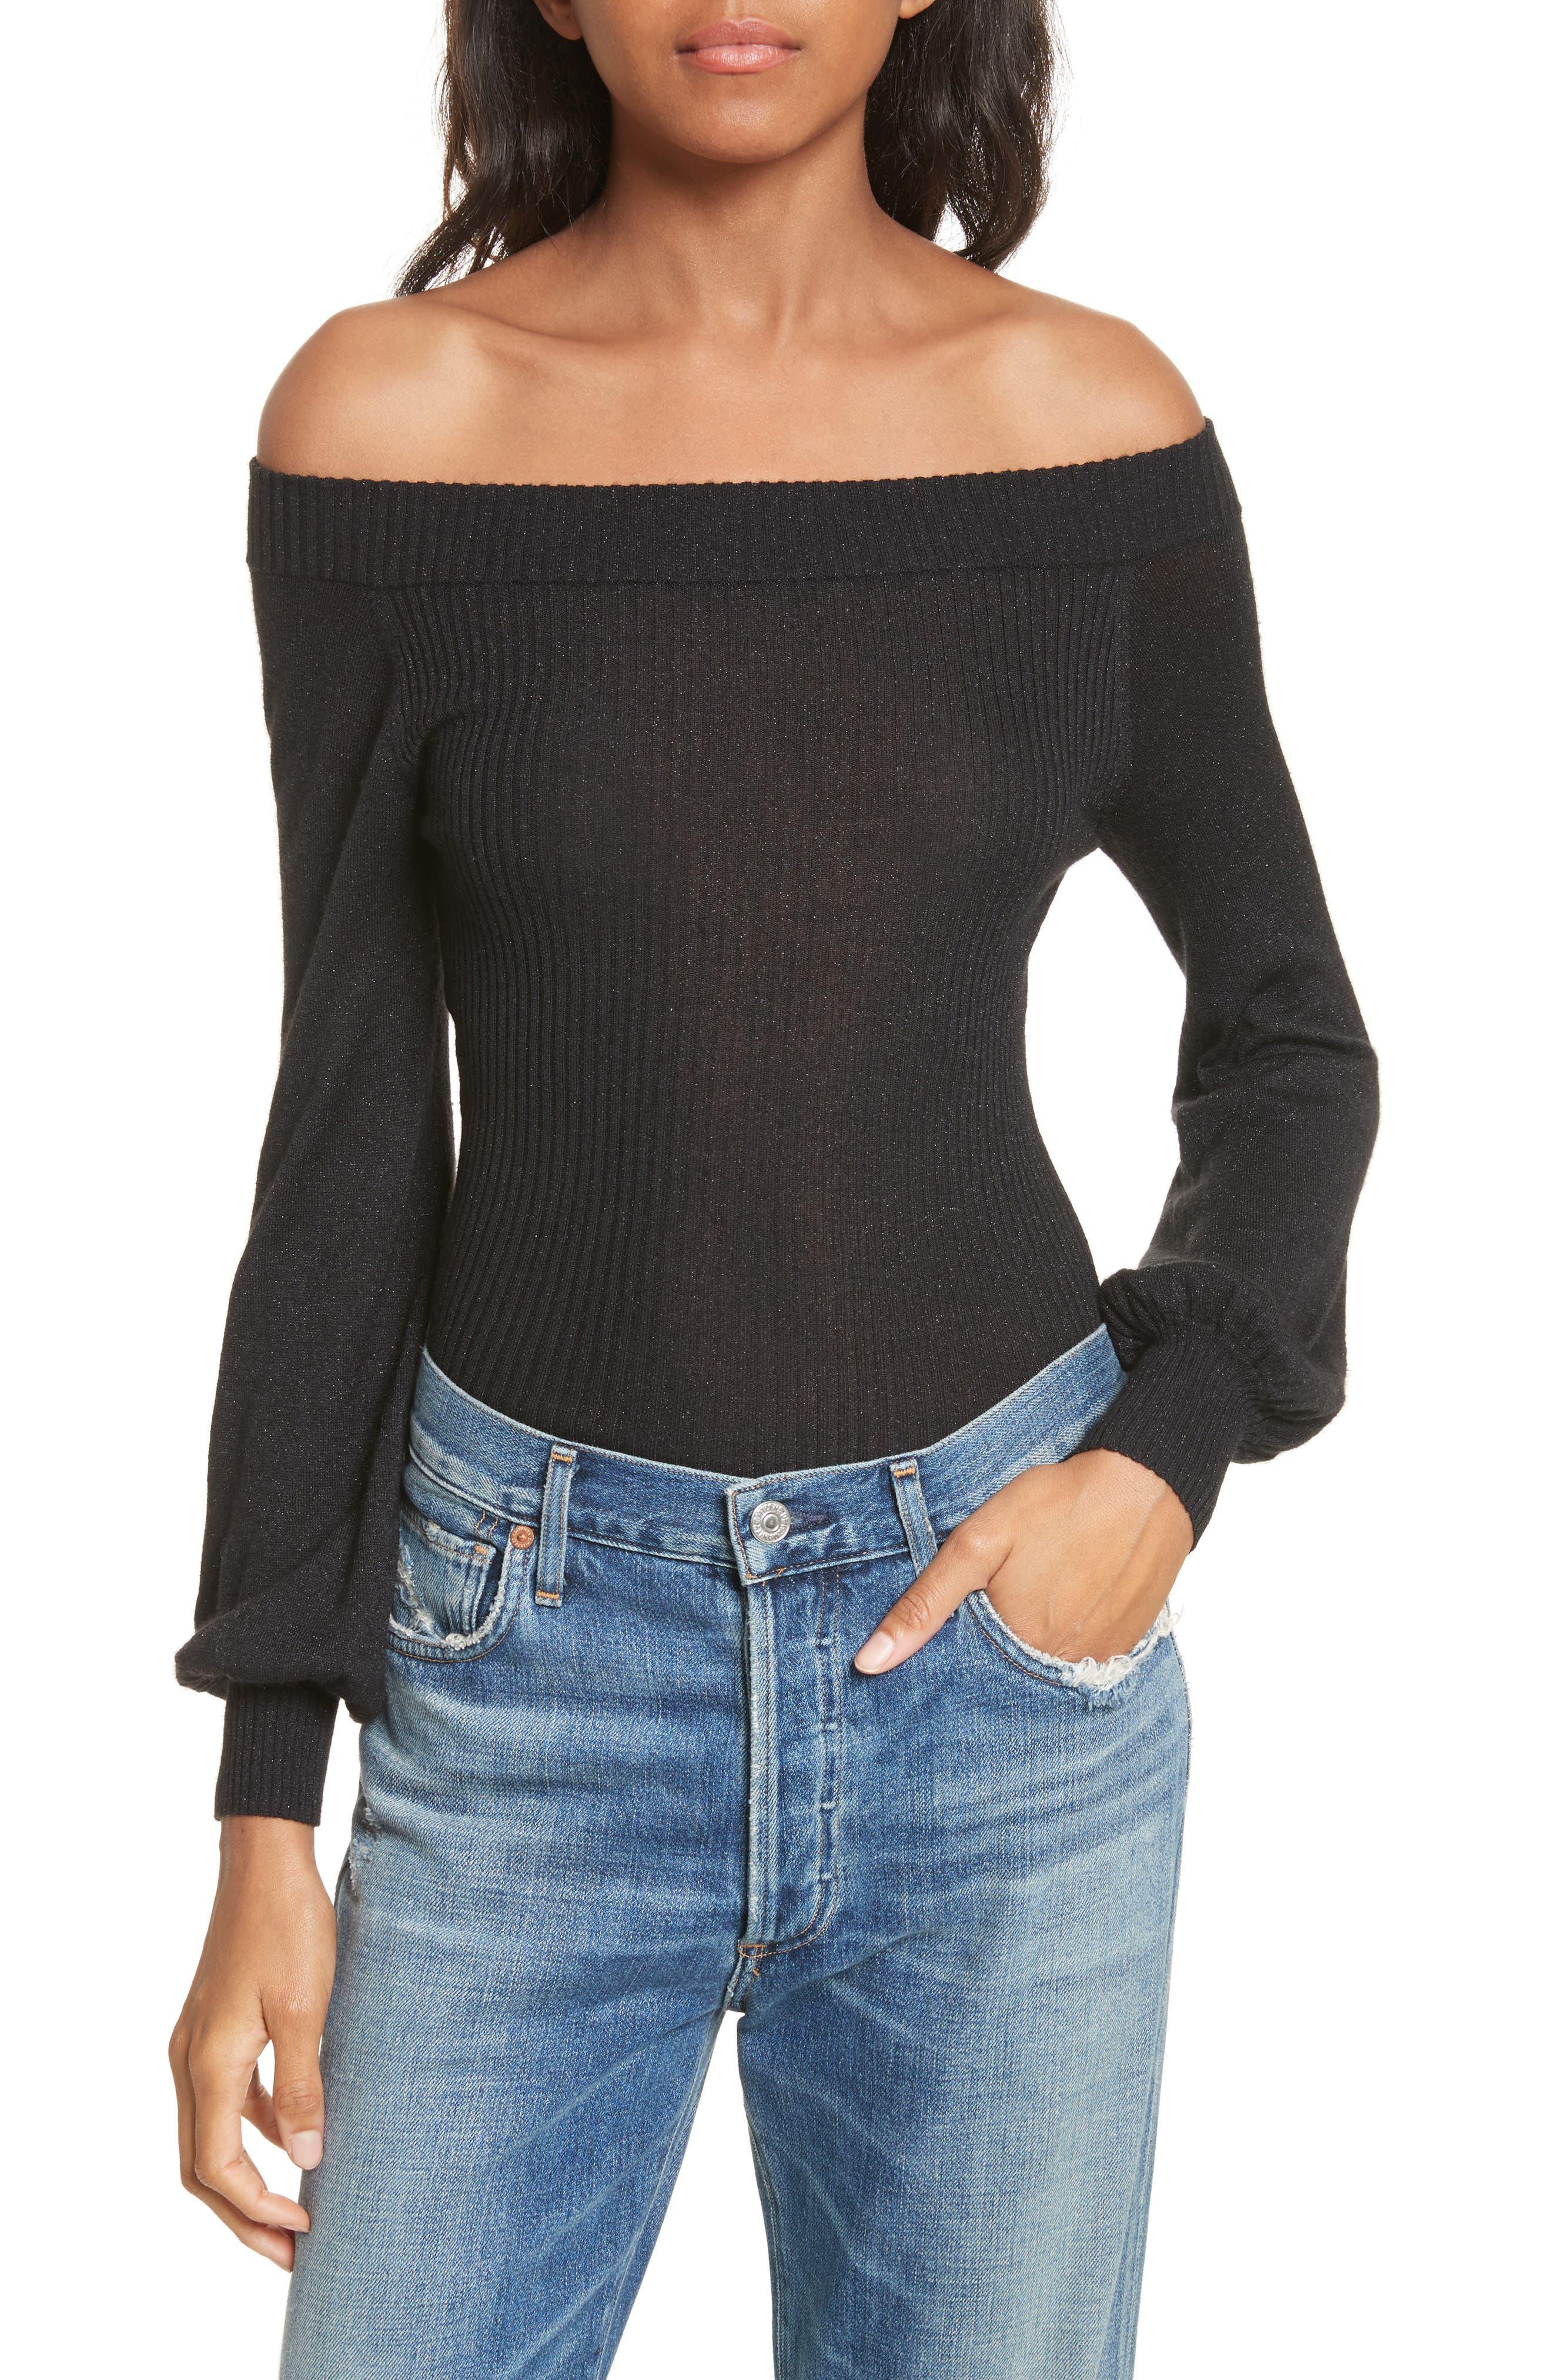 Alternate Image 1 Selected - autumn cashmere Metallic Cashmere & Silk Blend Off the Shoulder Top